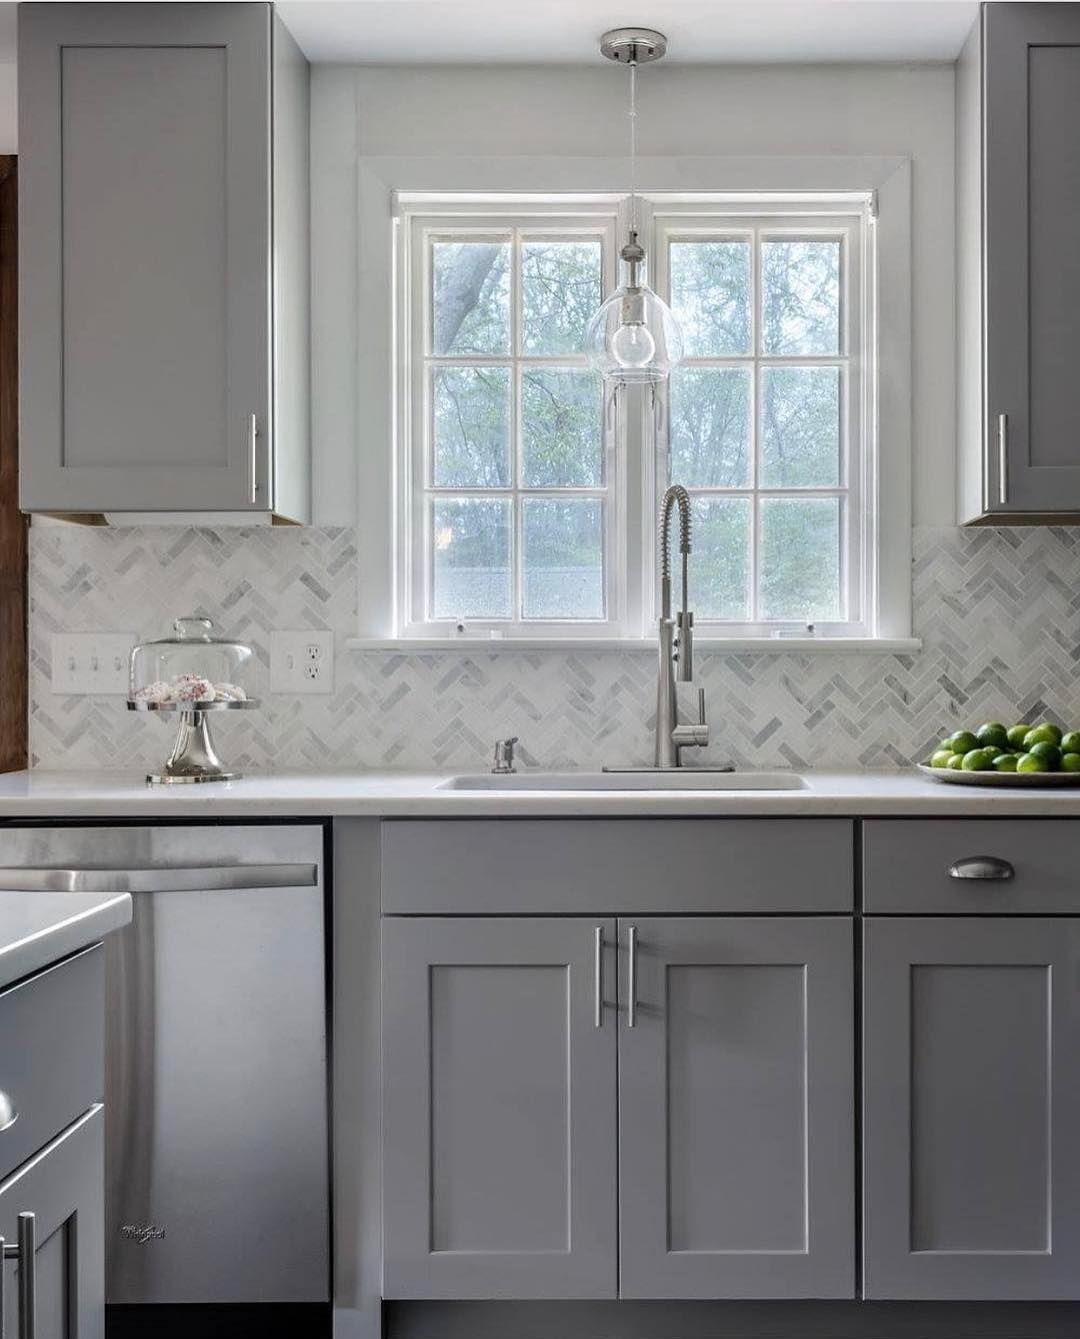 Gray kitchen for the home in pinterest kitchen kitchen